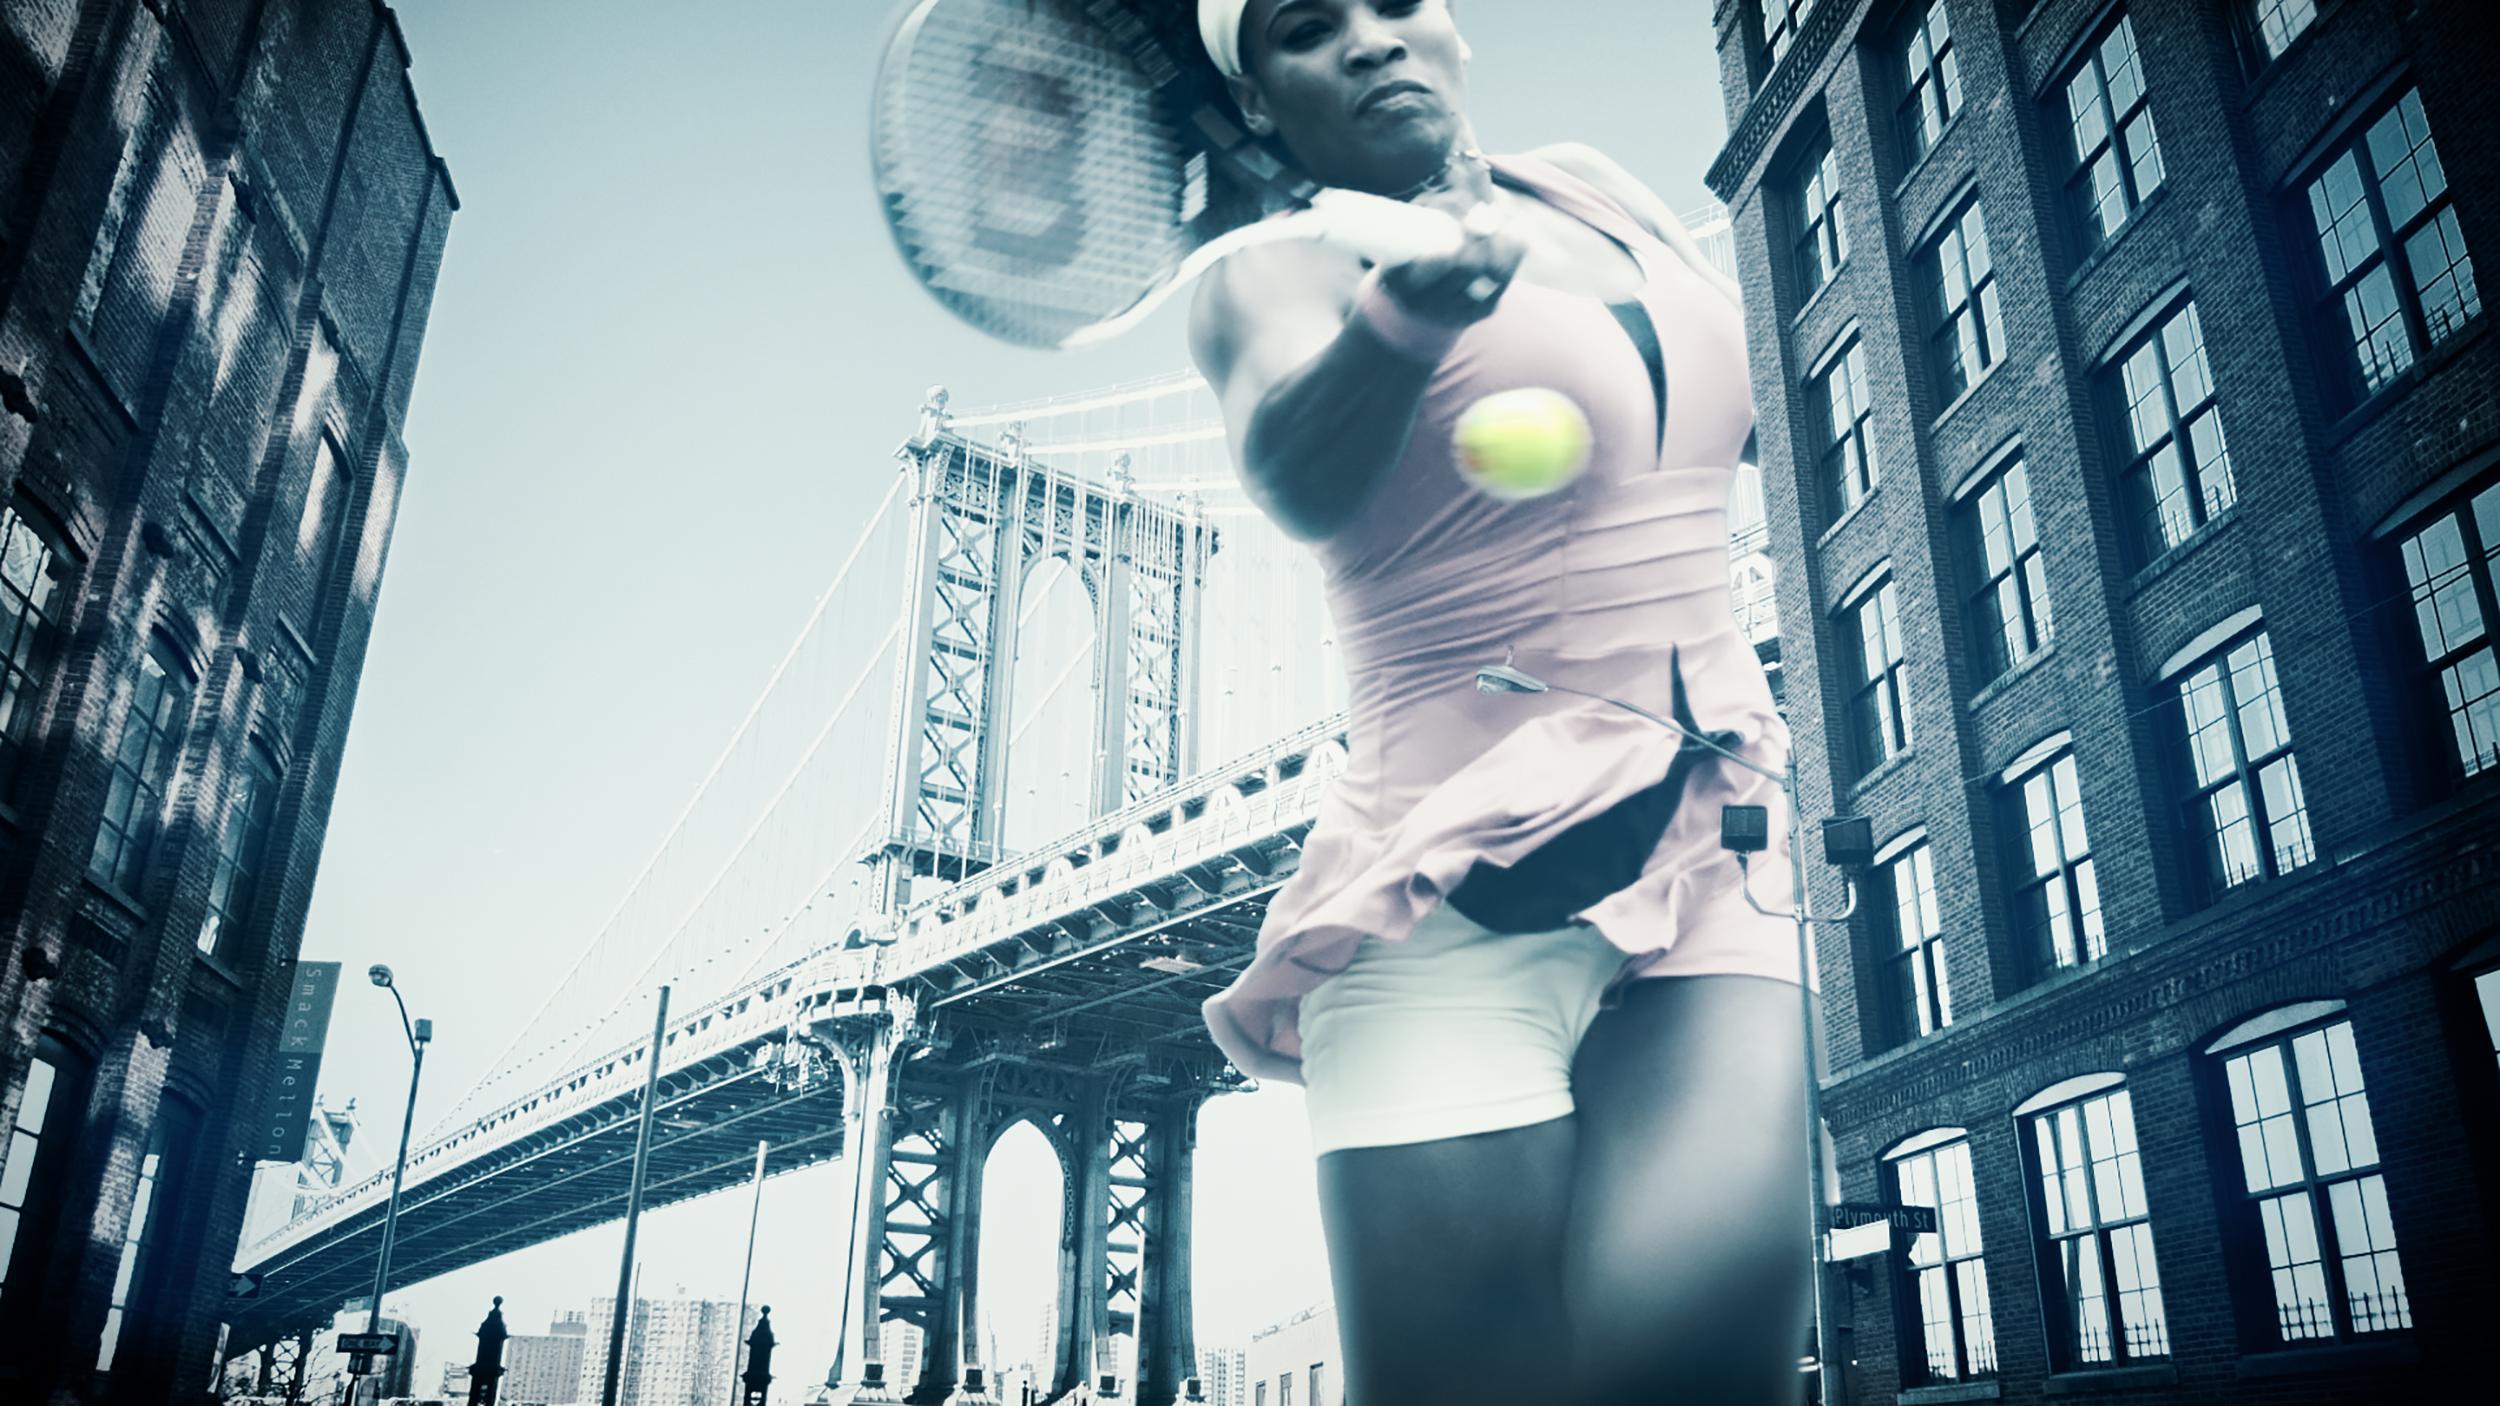 Serena Brooklyn Bridge_01 (00069).jpg